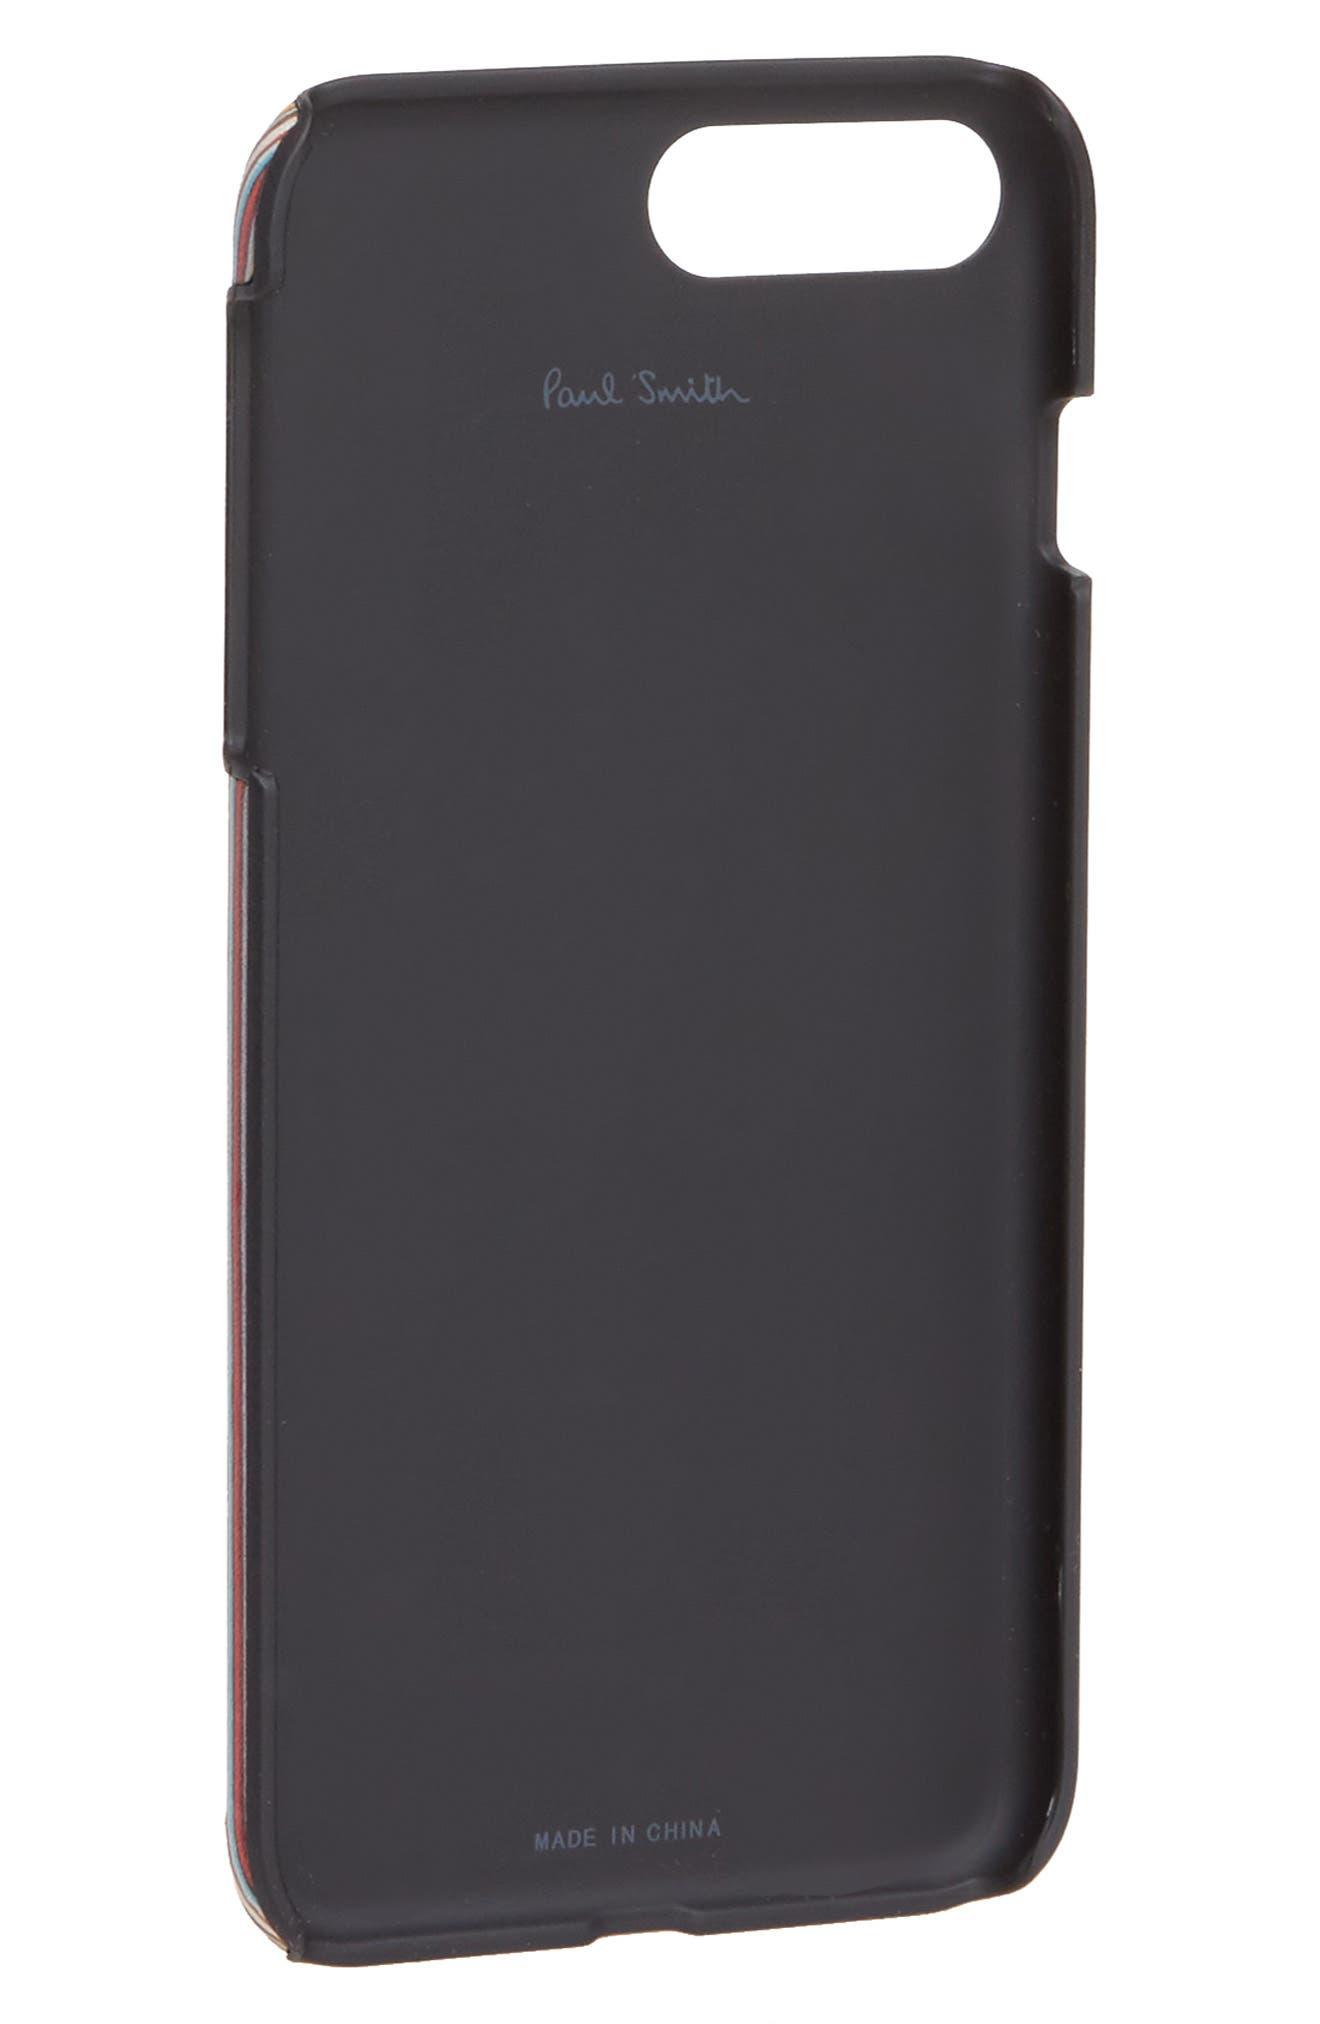 Multistripe iPhone 7 Plus/8 Plus Case,                             Alternate thumbnail 2, color,                             Black